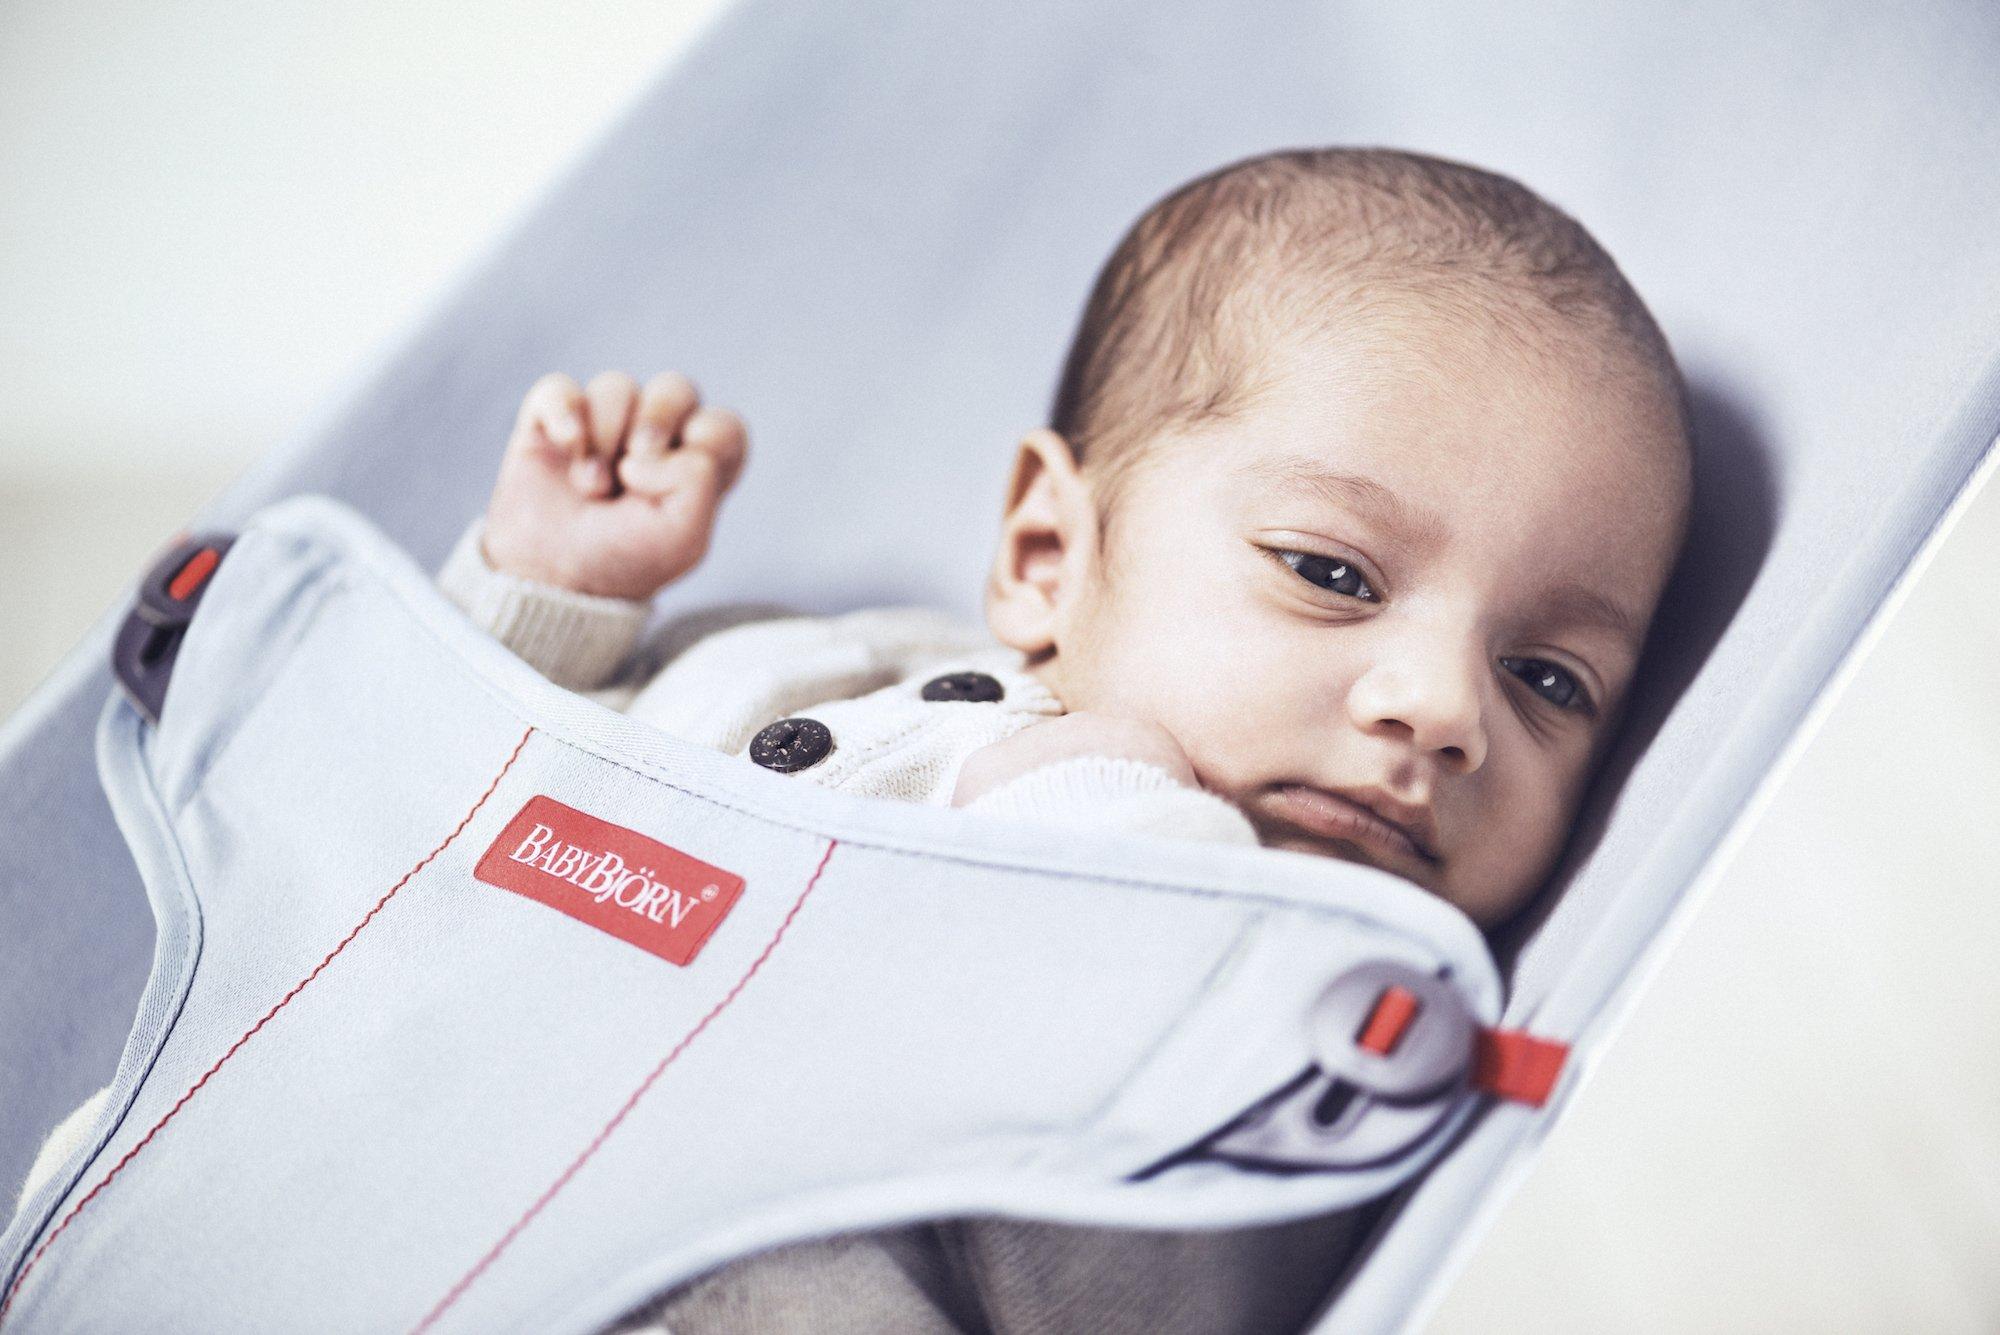 BabyBjorn Mini Cotton Bouncer, Gray/Jersey by BabyBjörn (Image #6)